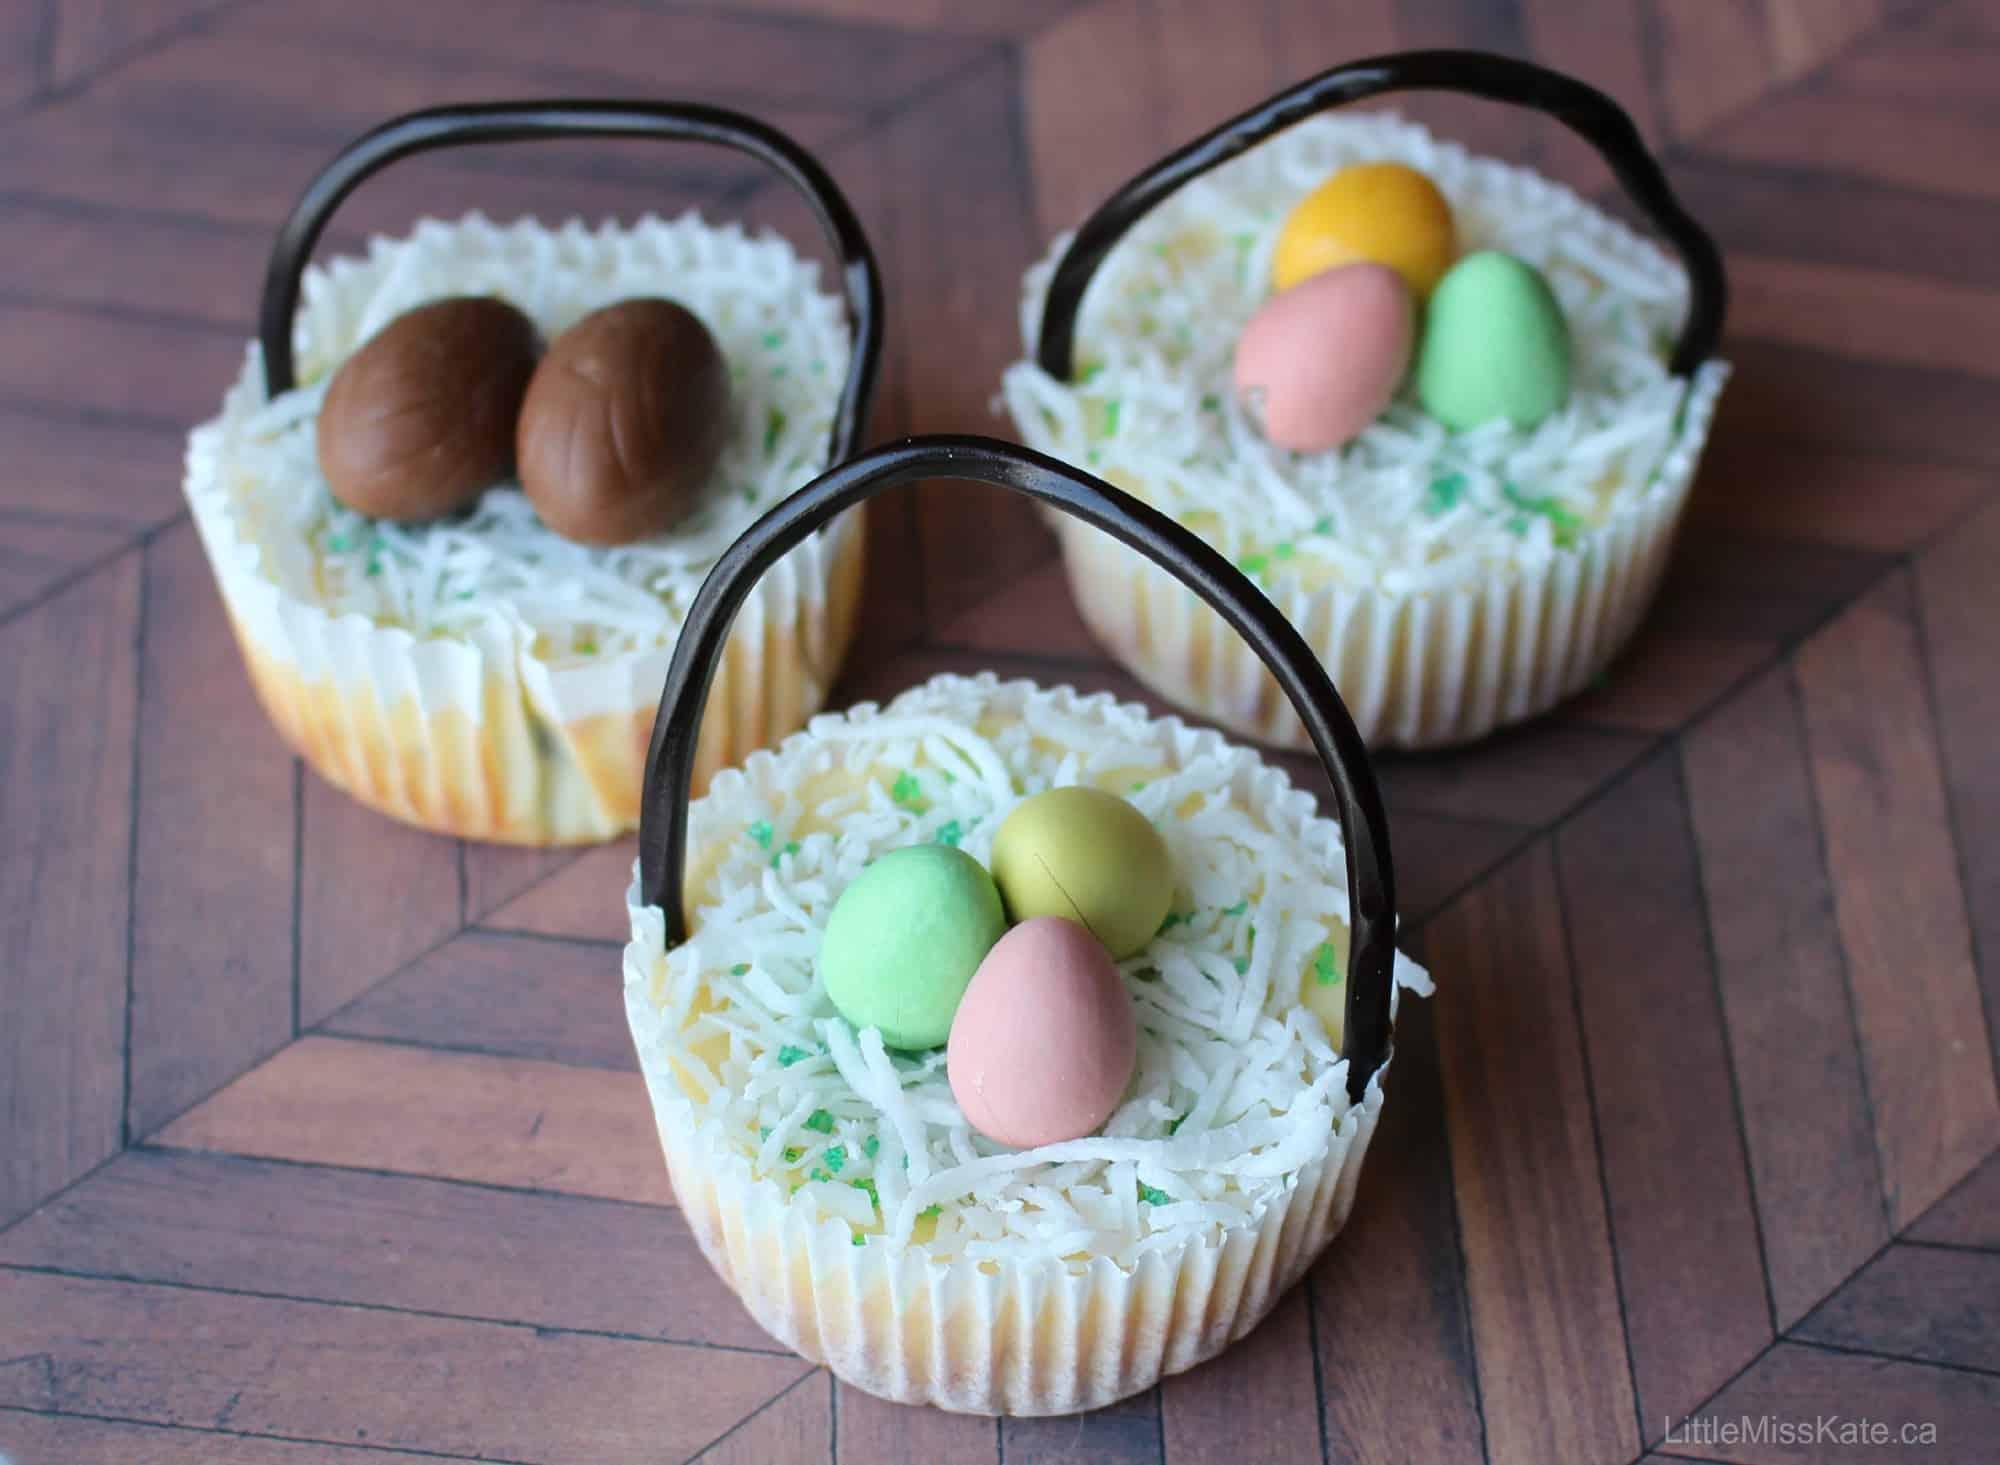 Mini Easter Basket Cheesecakes - Easter Dessert Idea via littlemisskate.ca